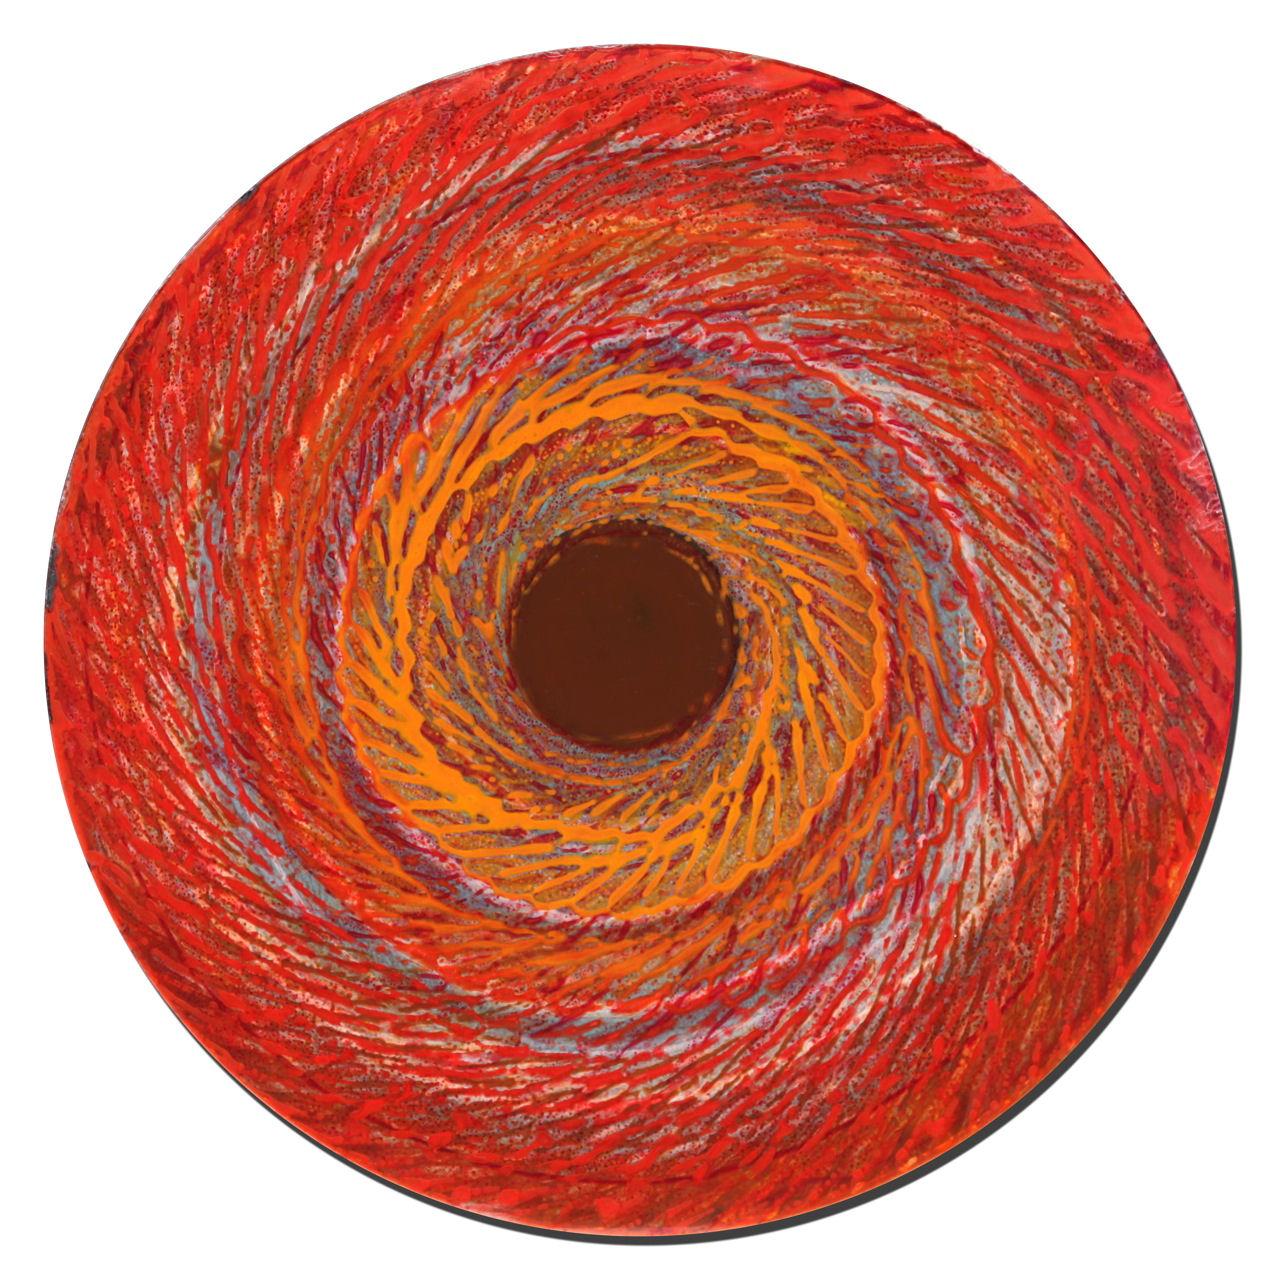 Reticulate Disc 9 by  warm  - Masterpiece Online